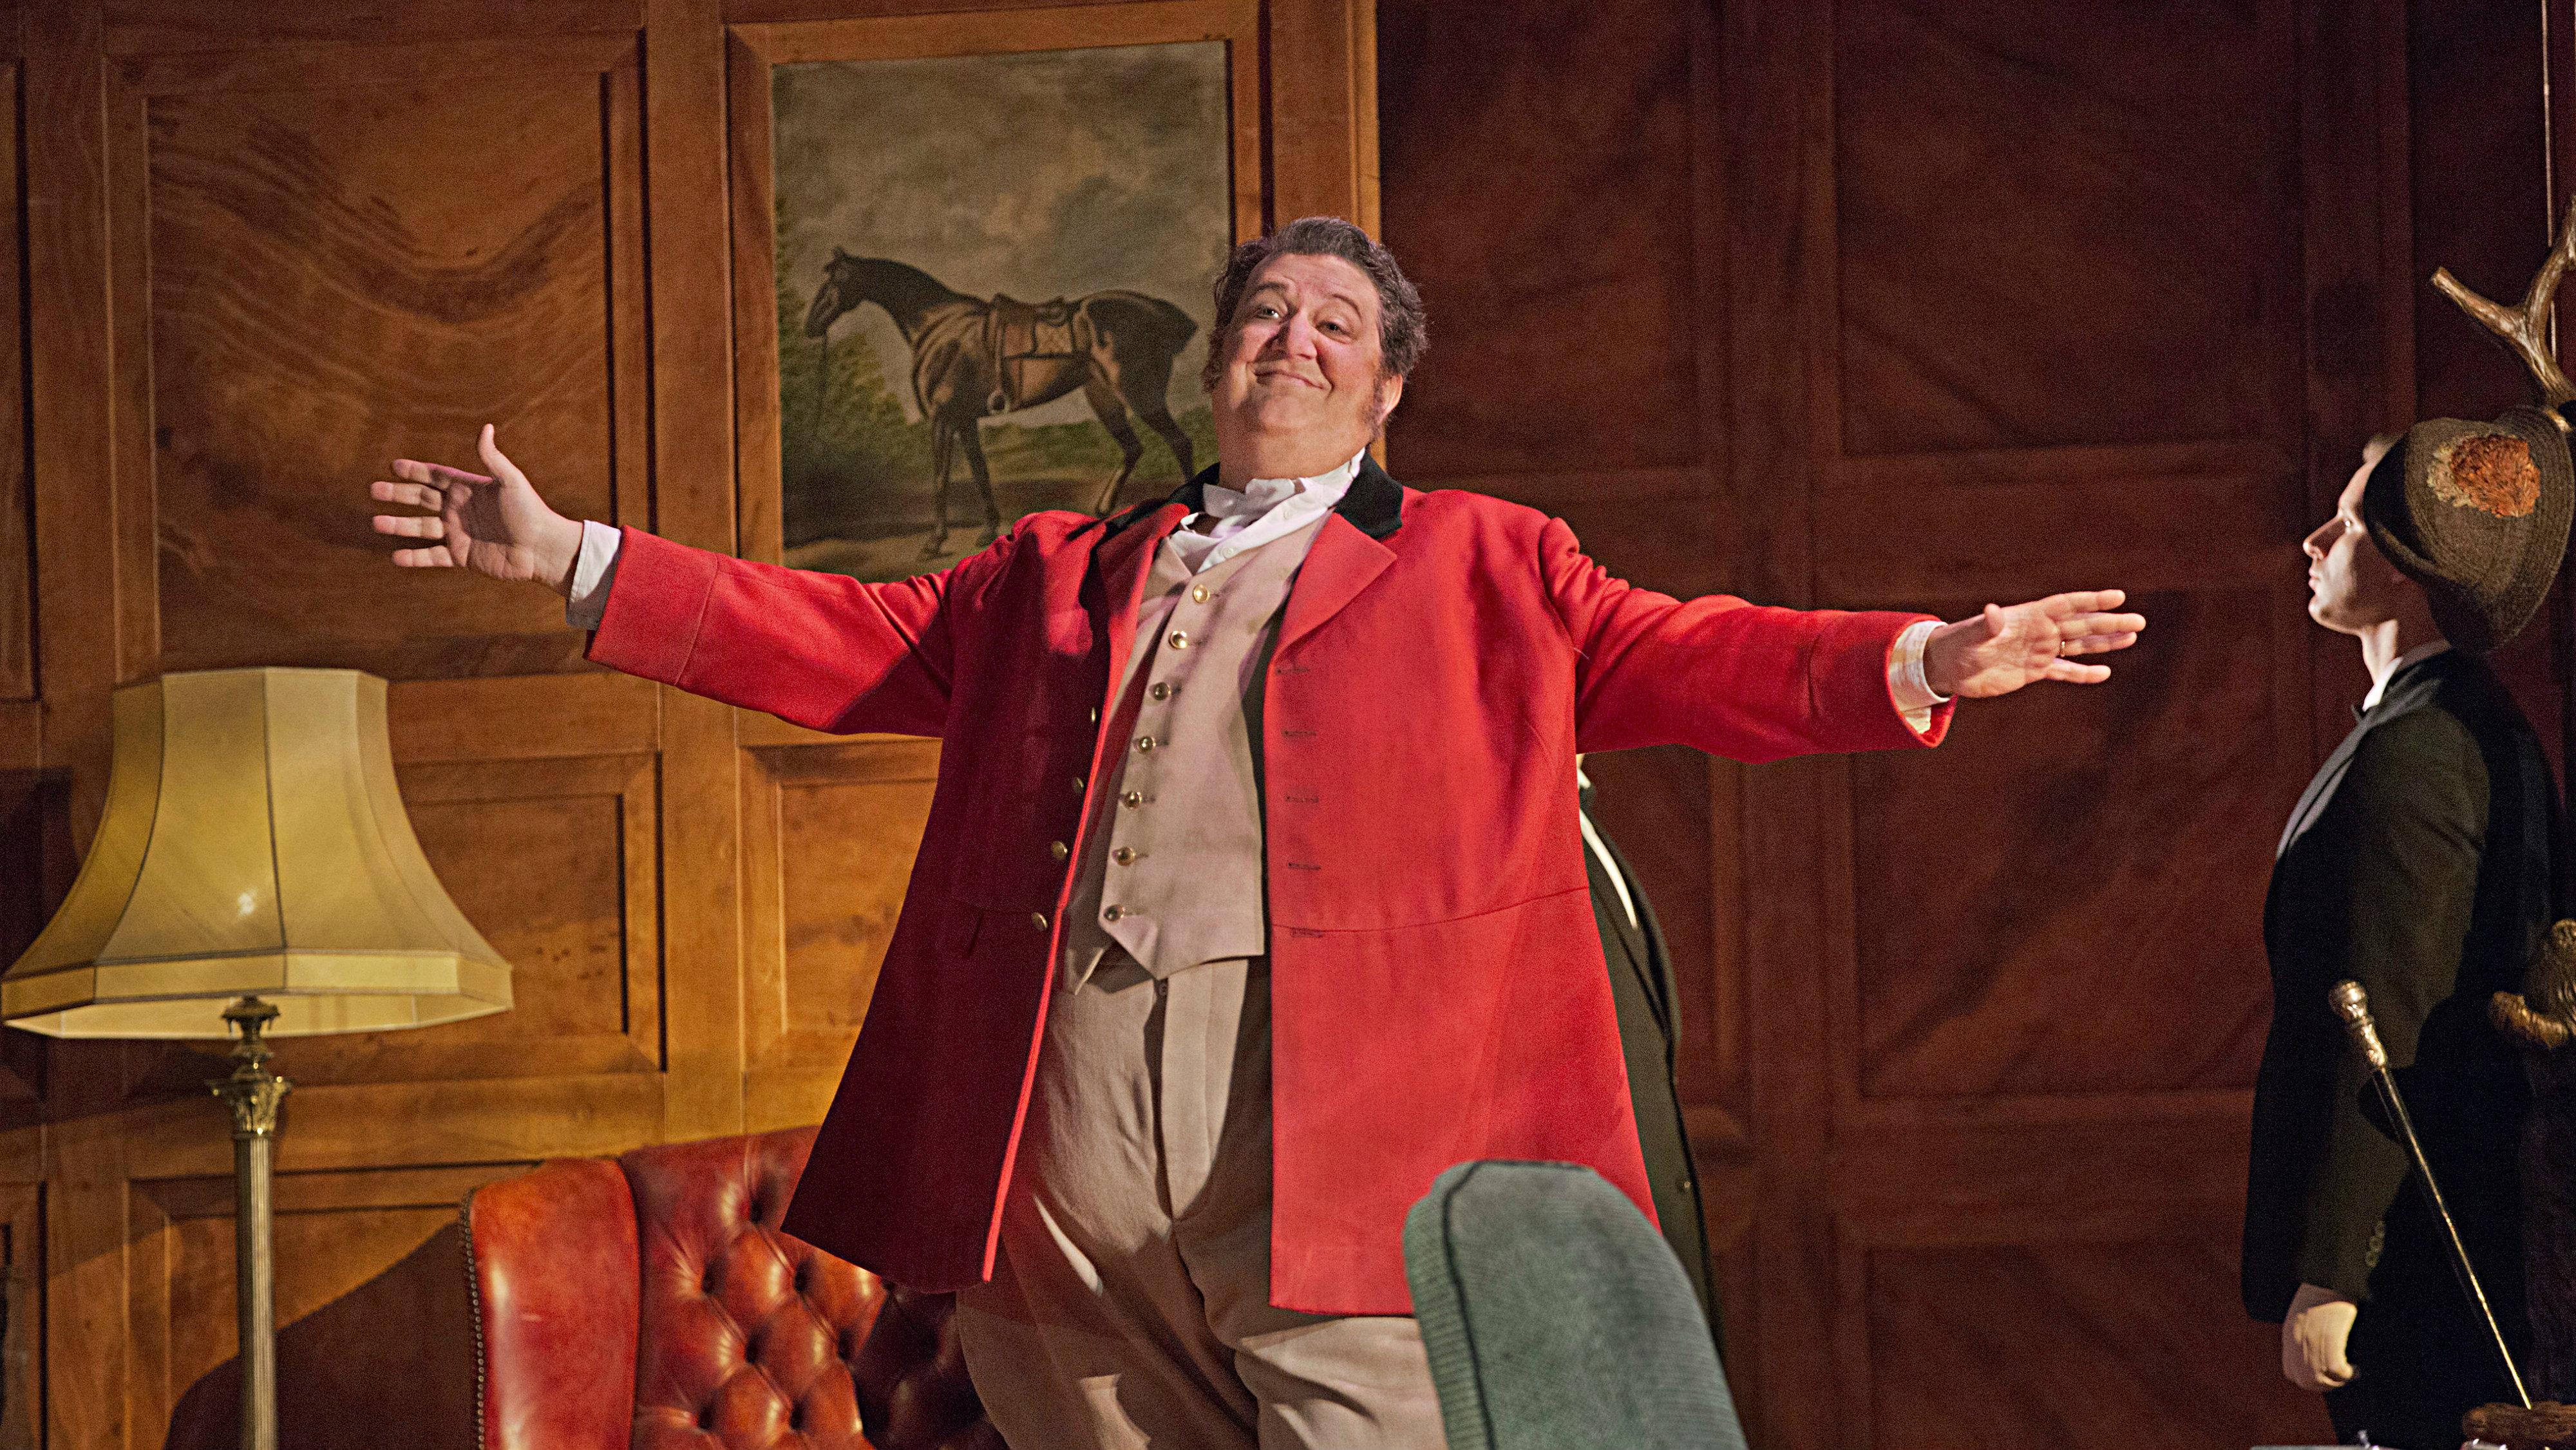 Met Opera Image: Falstaff